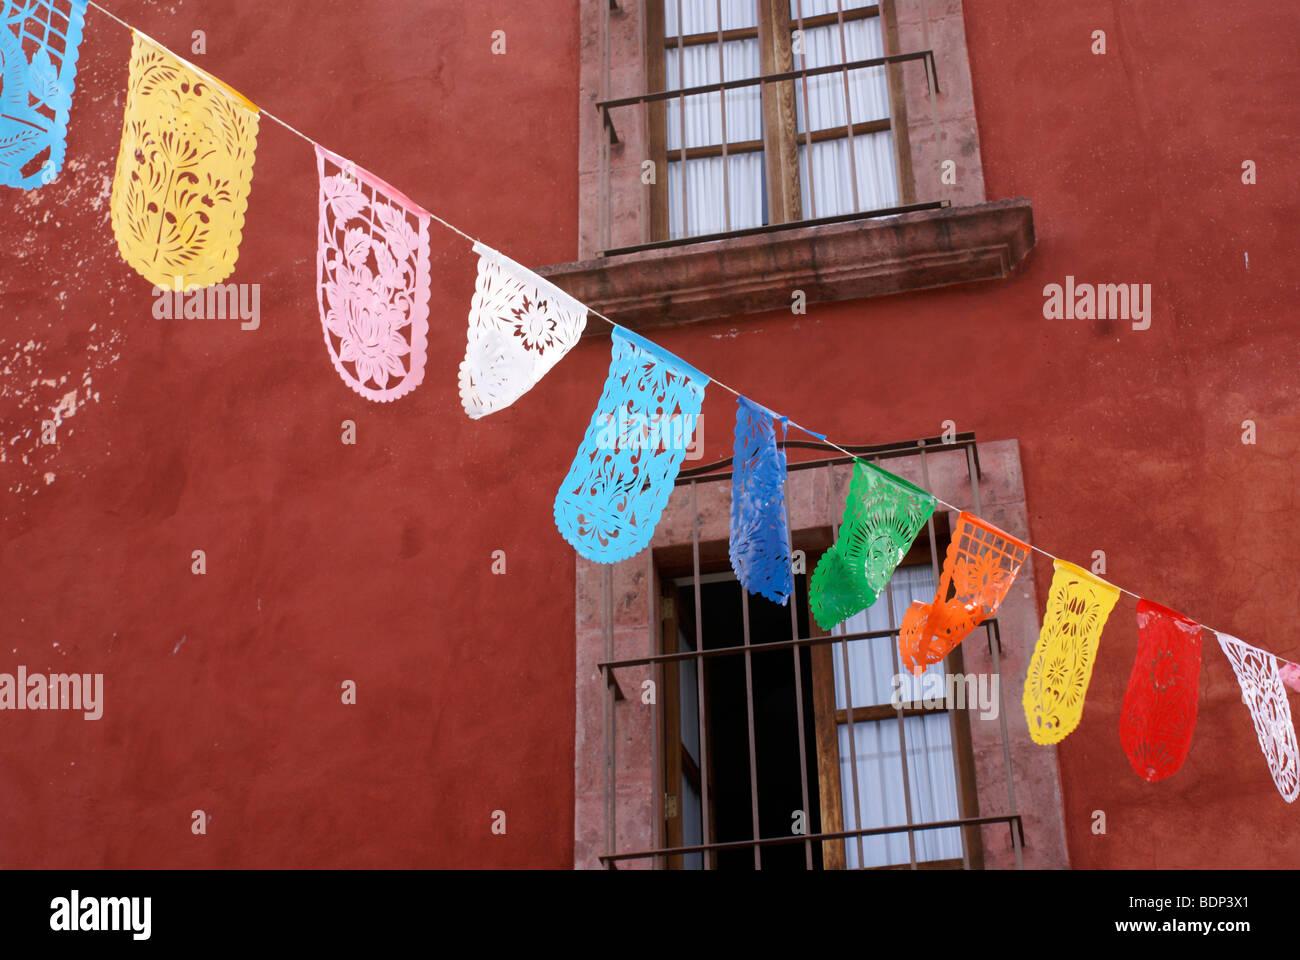 Colorful Mexican papel picado cutouts decorating a street in San Miguel de Allende, Mexico - Stock Image